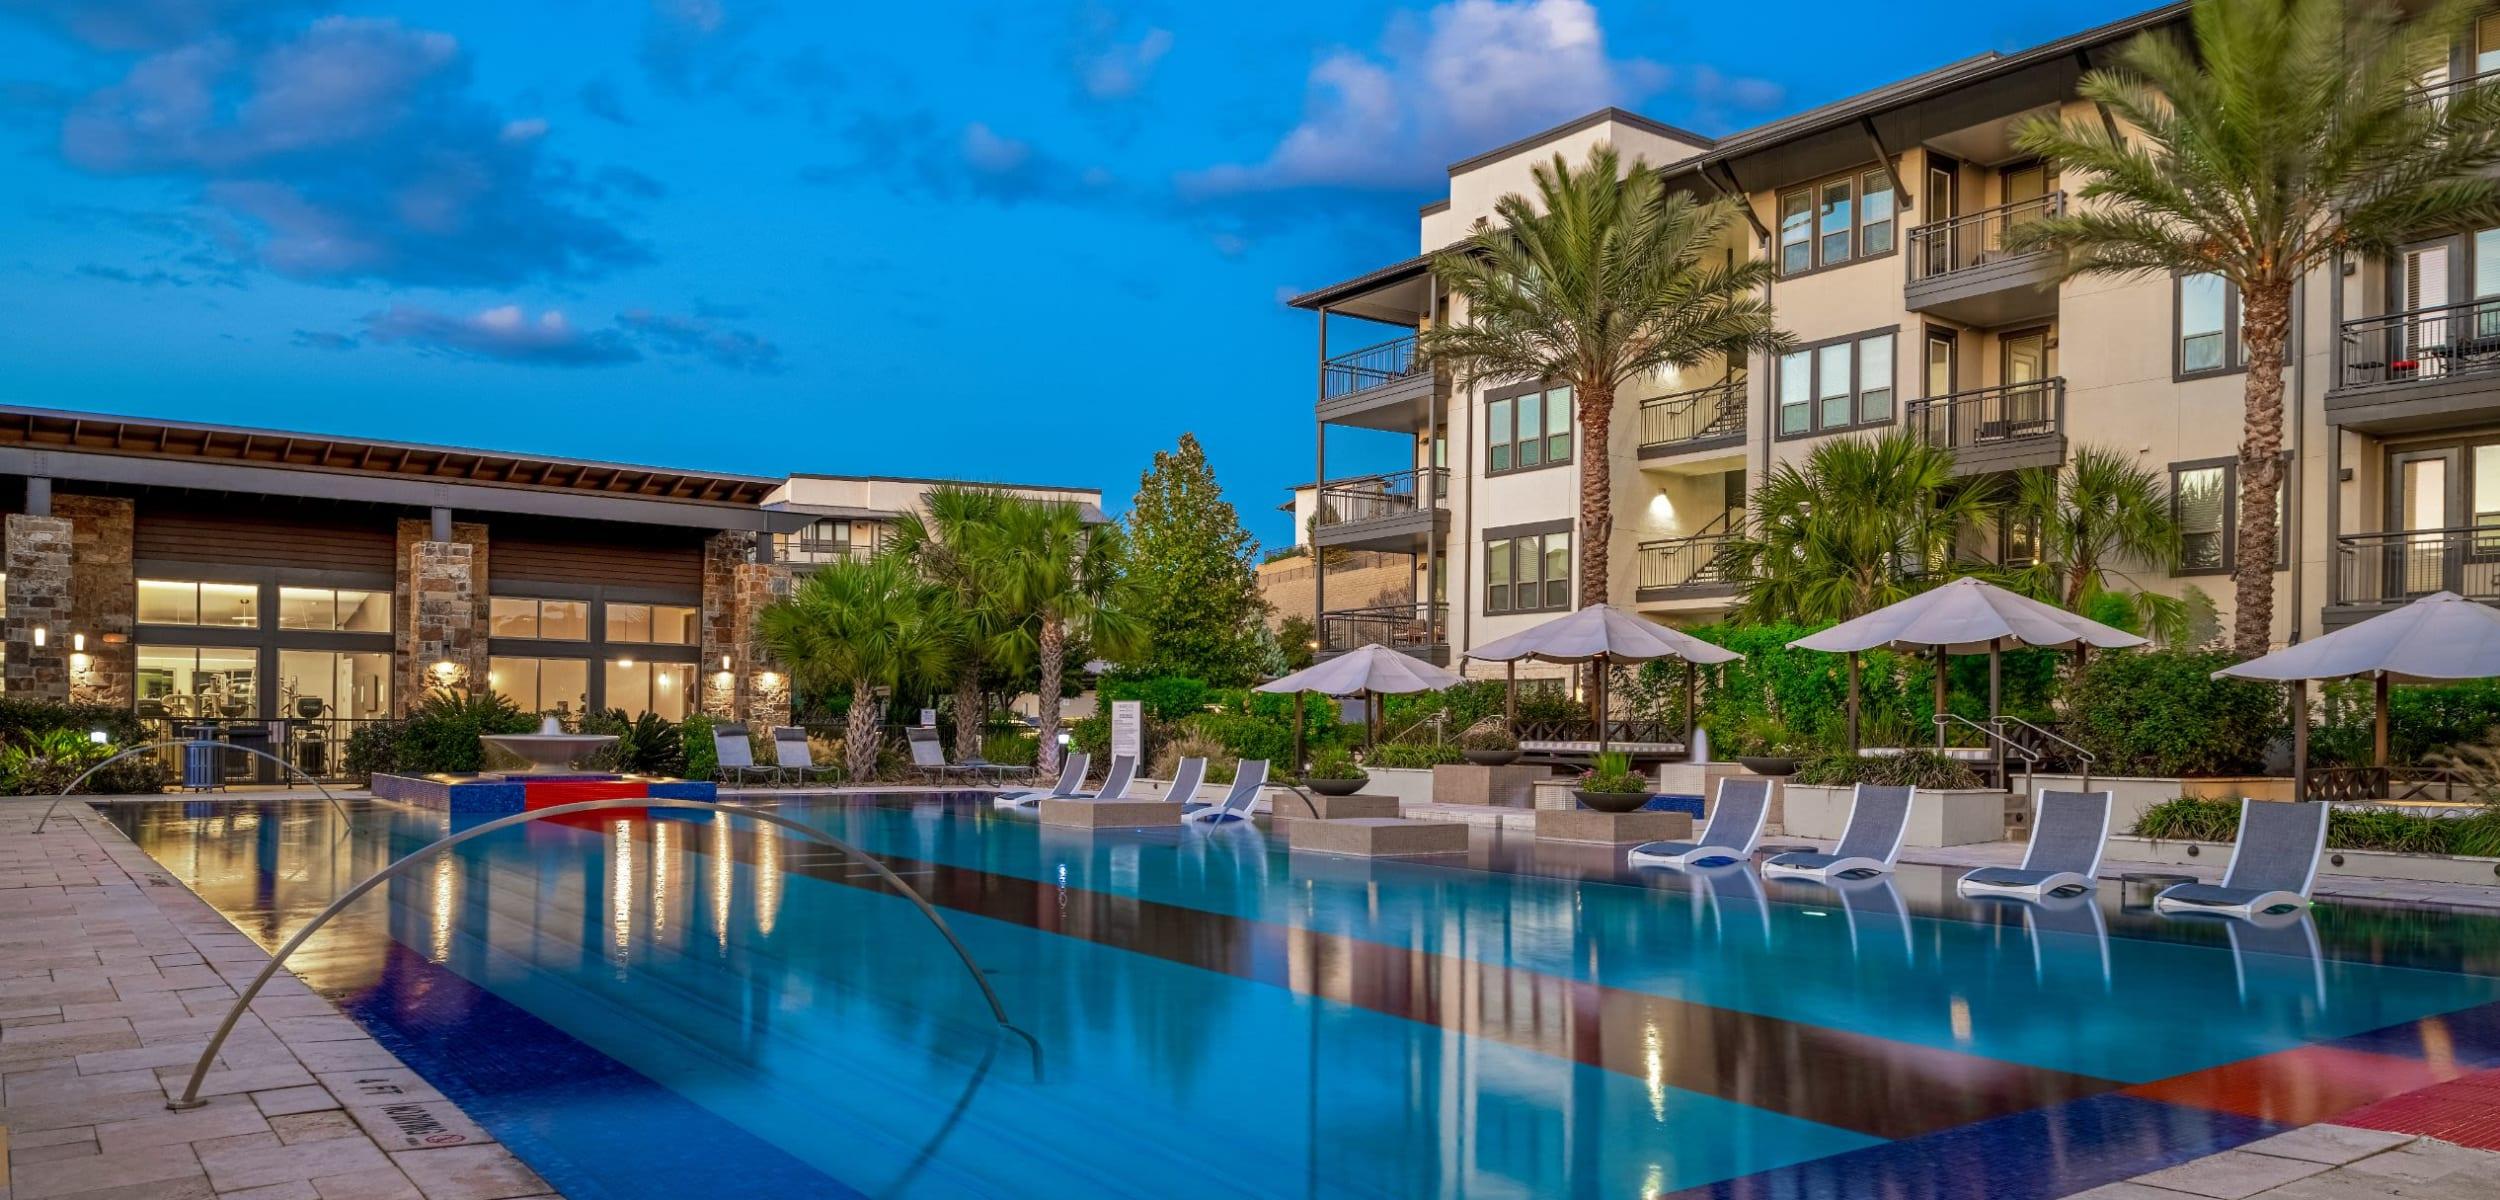 Resort style pool at Marquis Cresta Bella in San Antonio Texas,